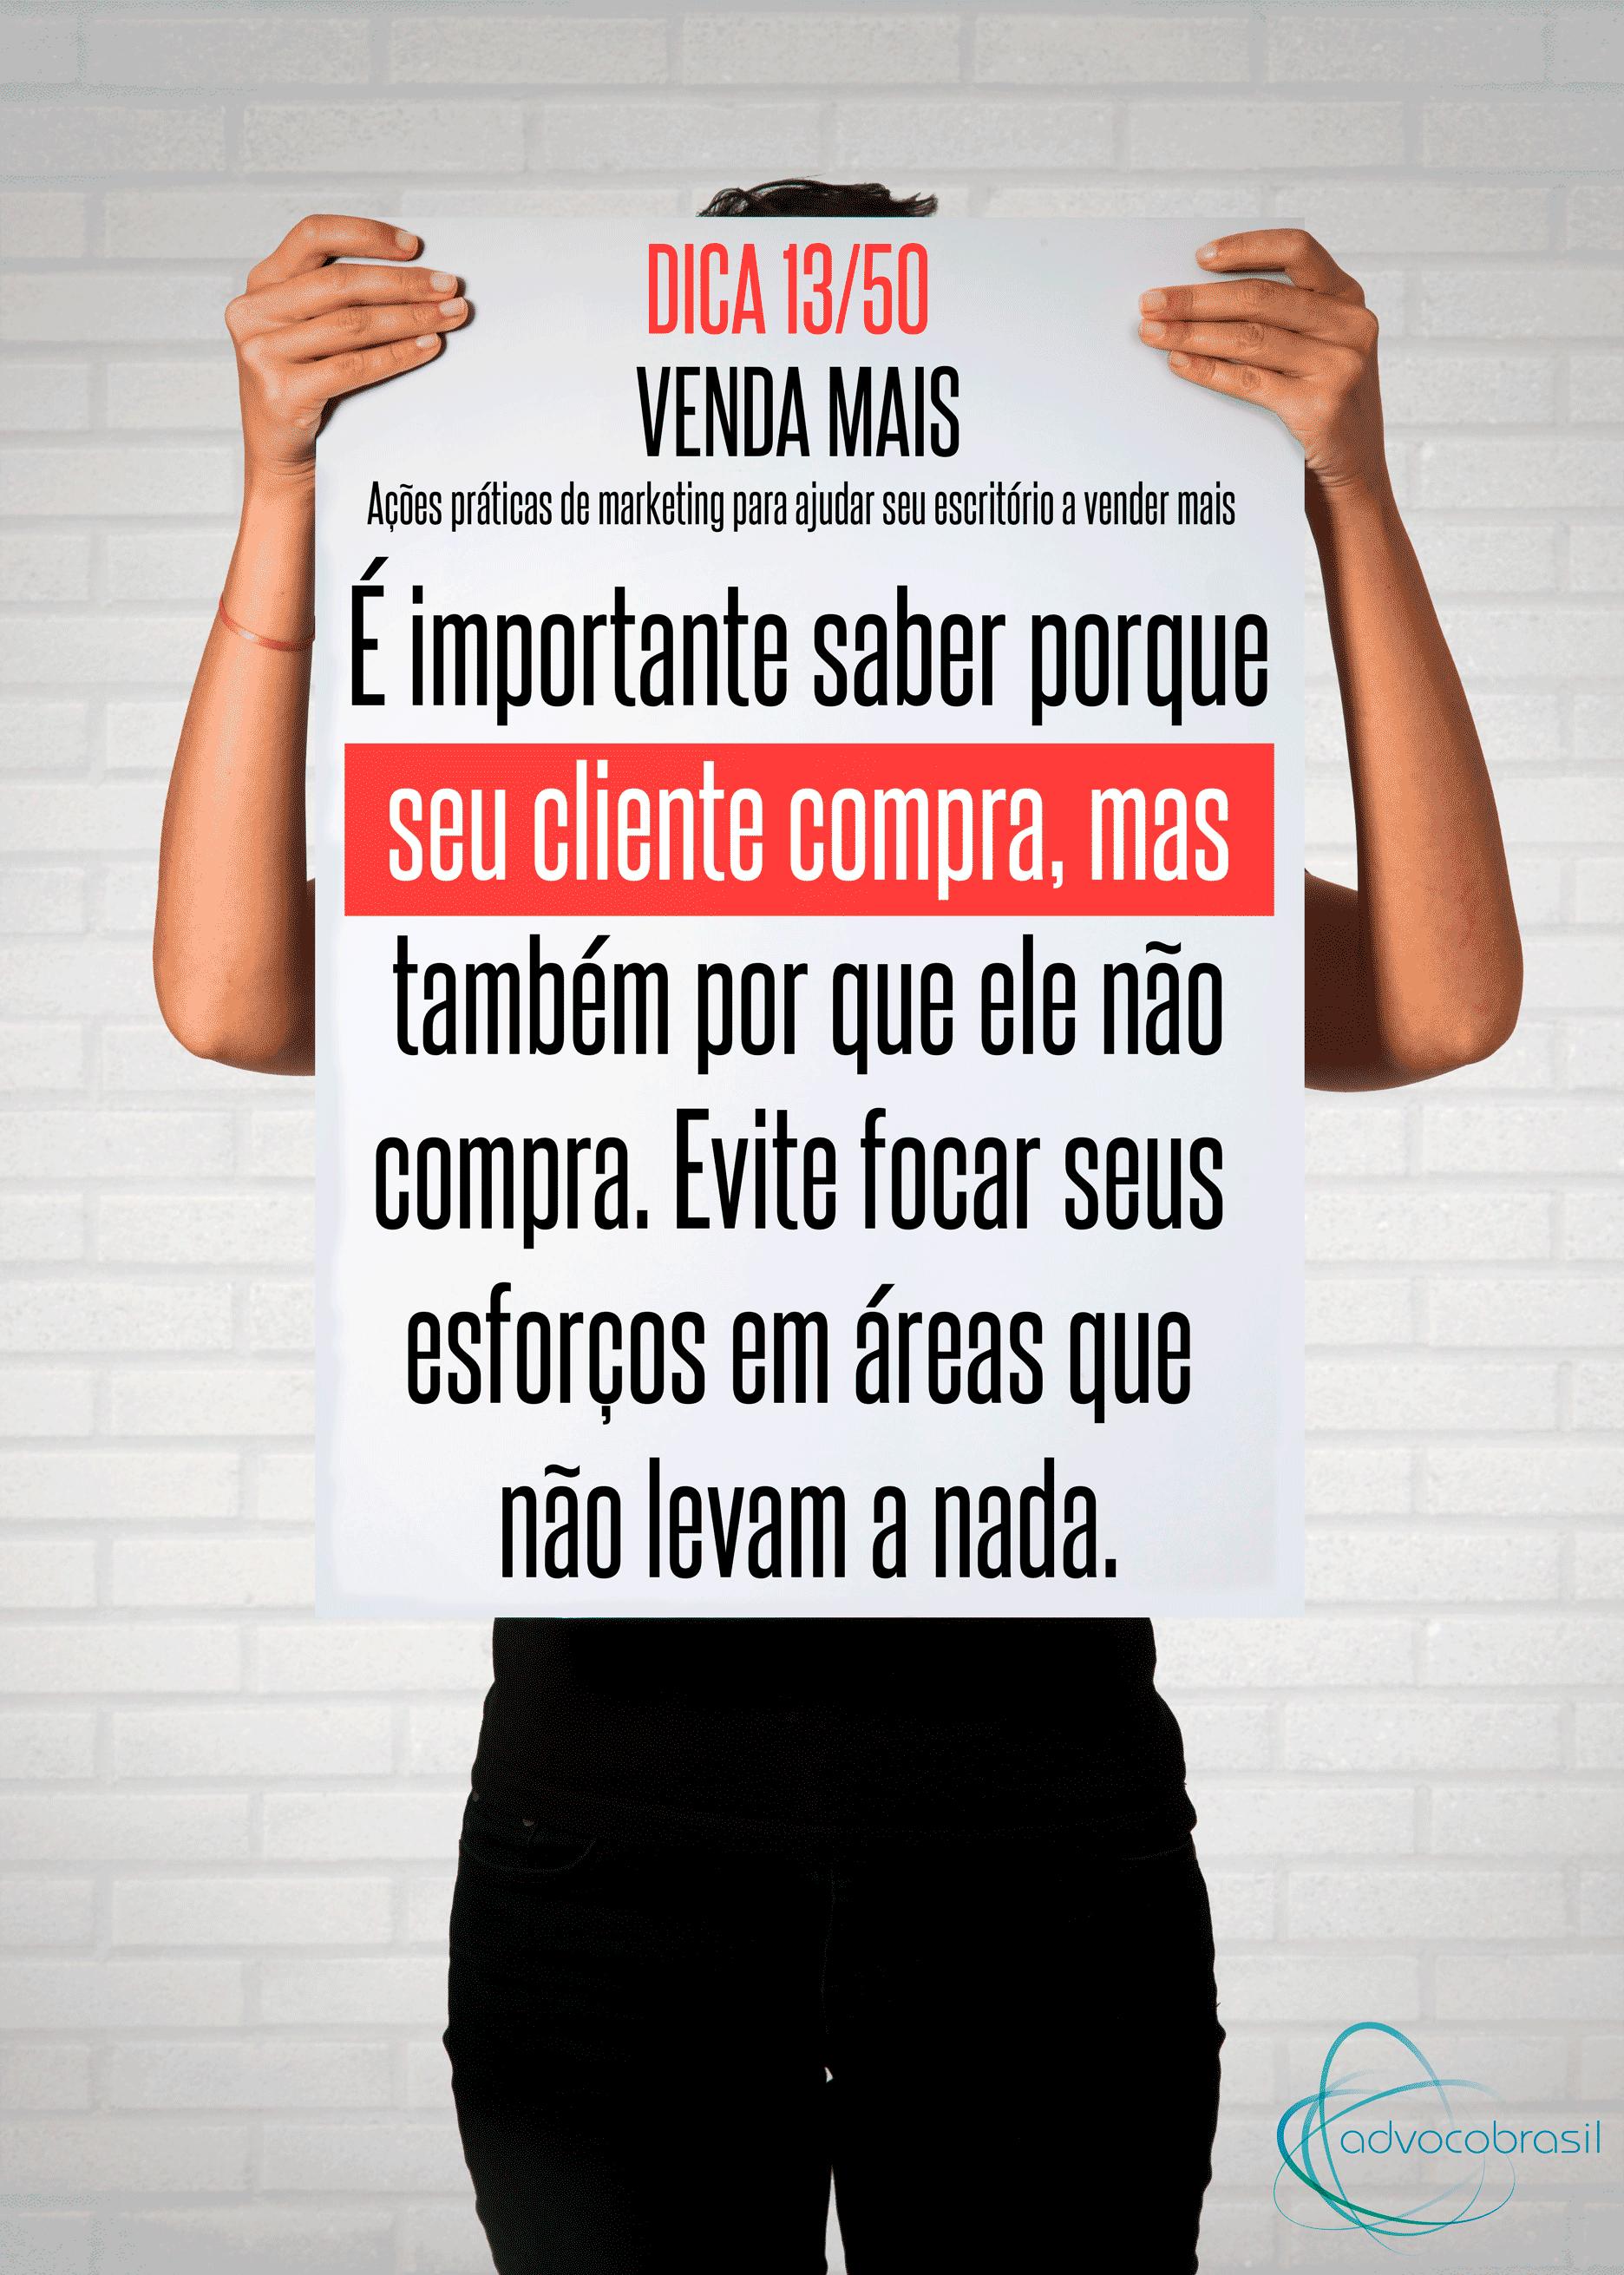 Advoco Brasil - Aprenda a vender mais